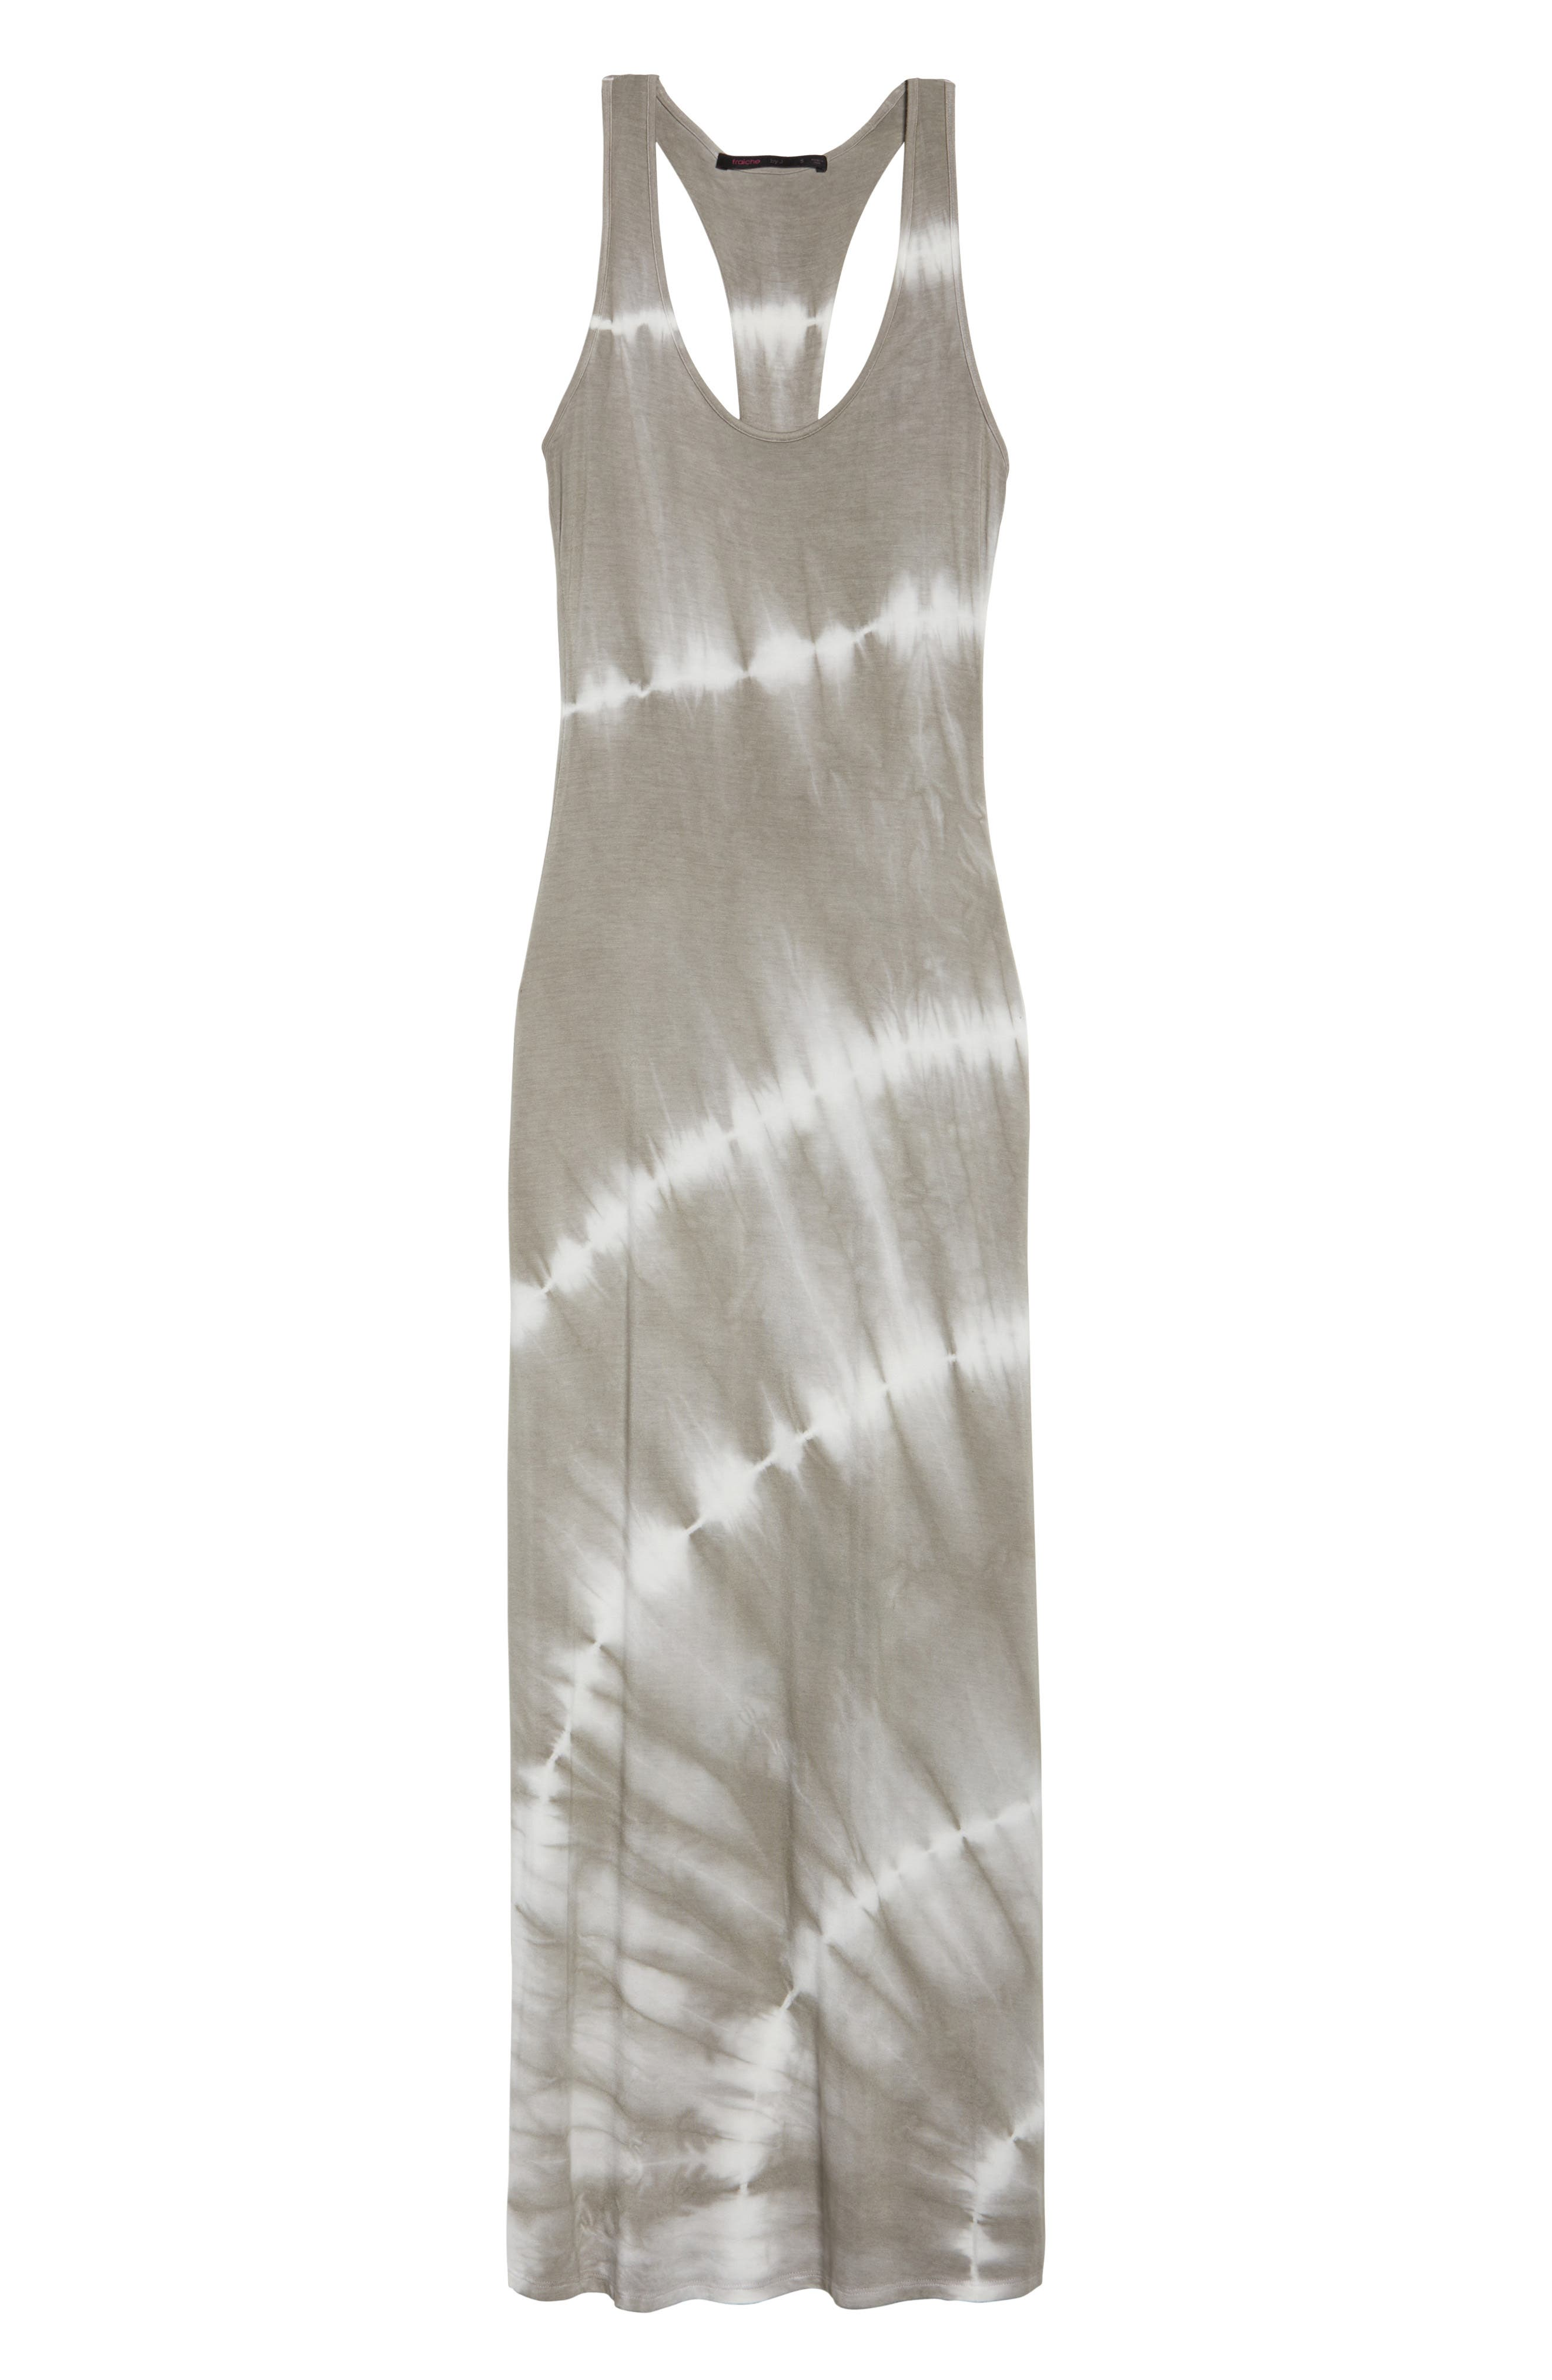 Tie Dye Racerback Maxi Dress,                             Alternate thumbnail 7, color,                             GREY/ WHITE